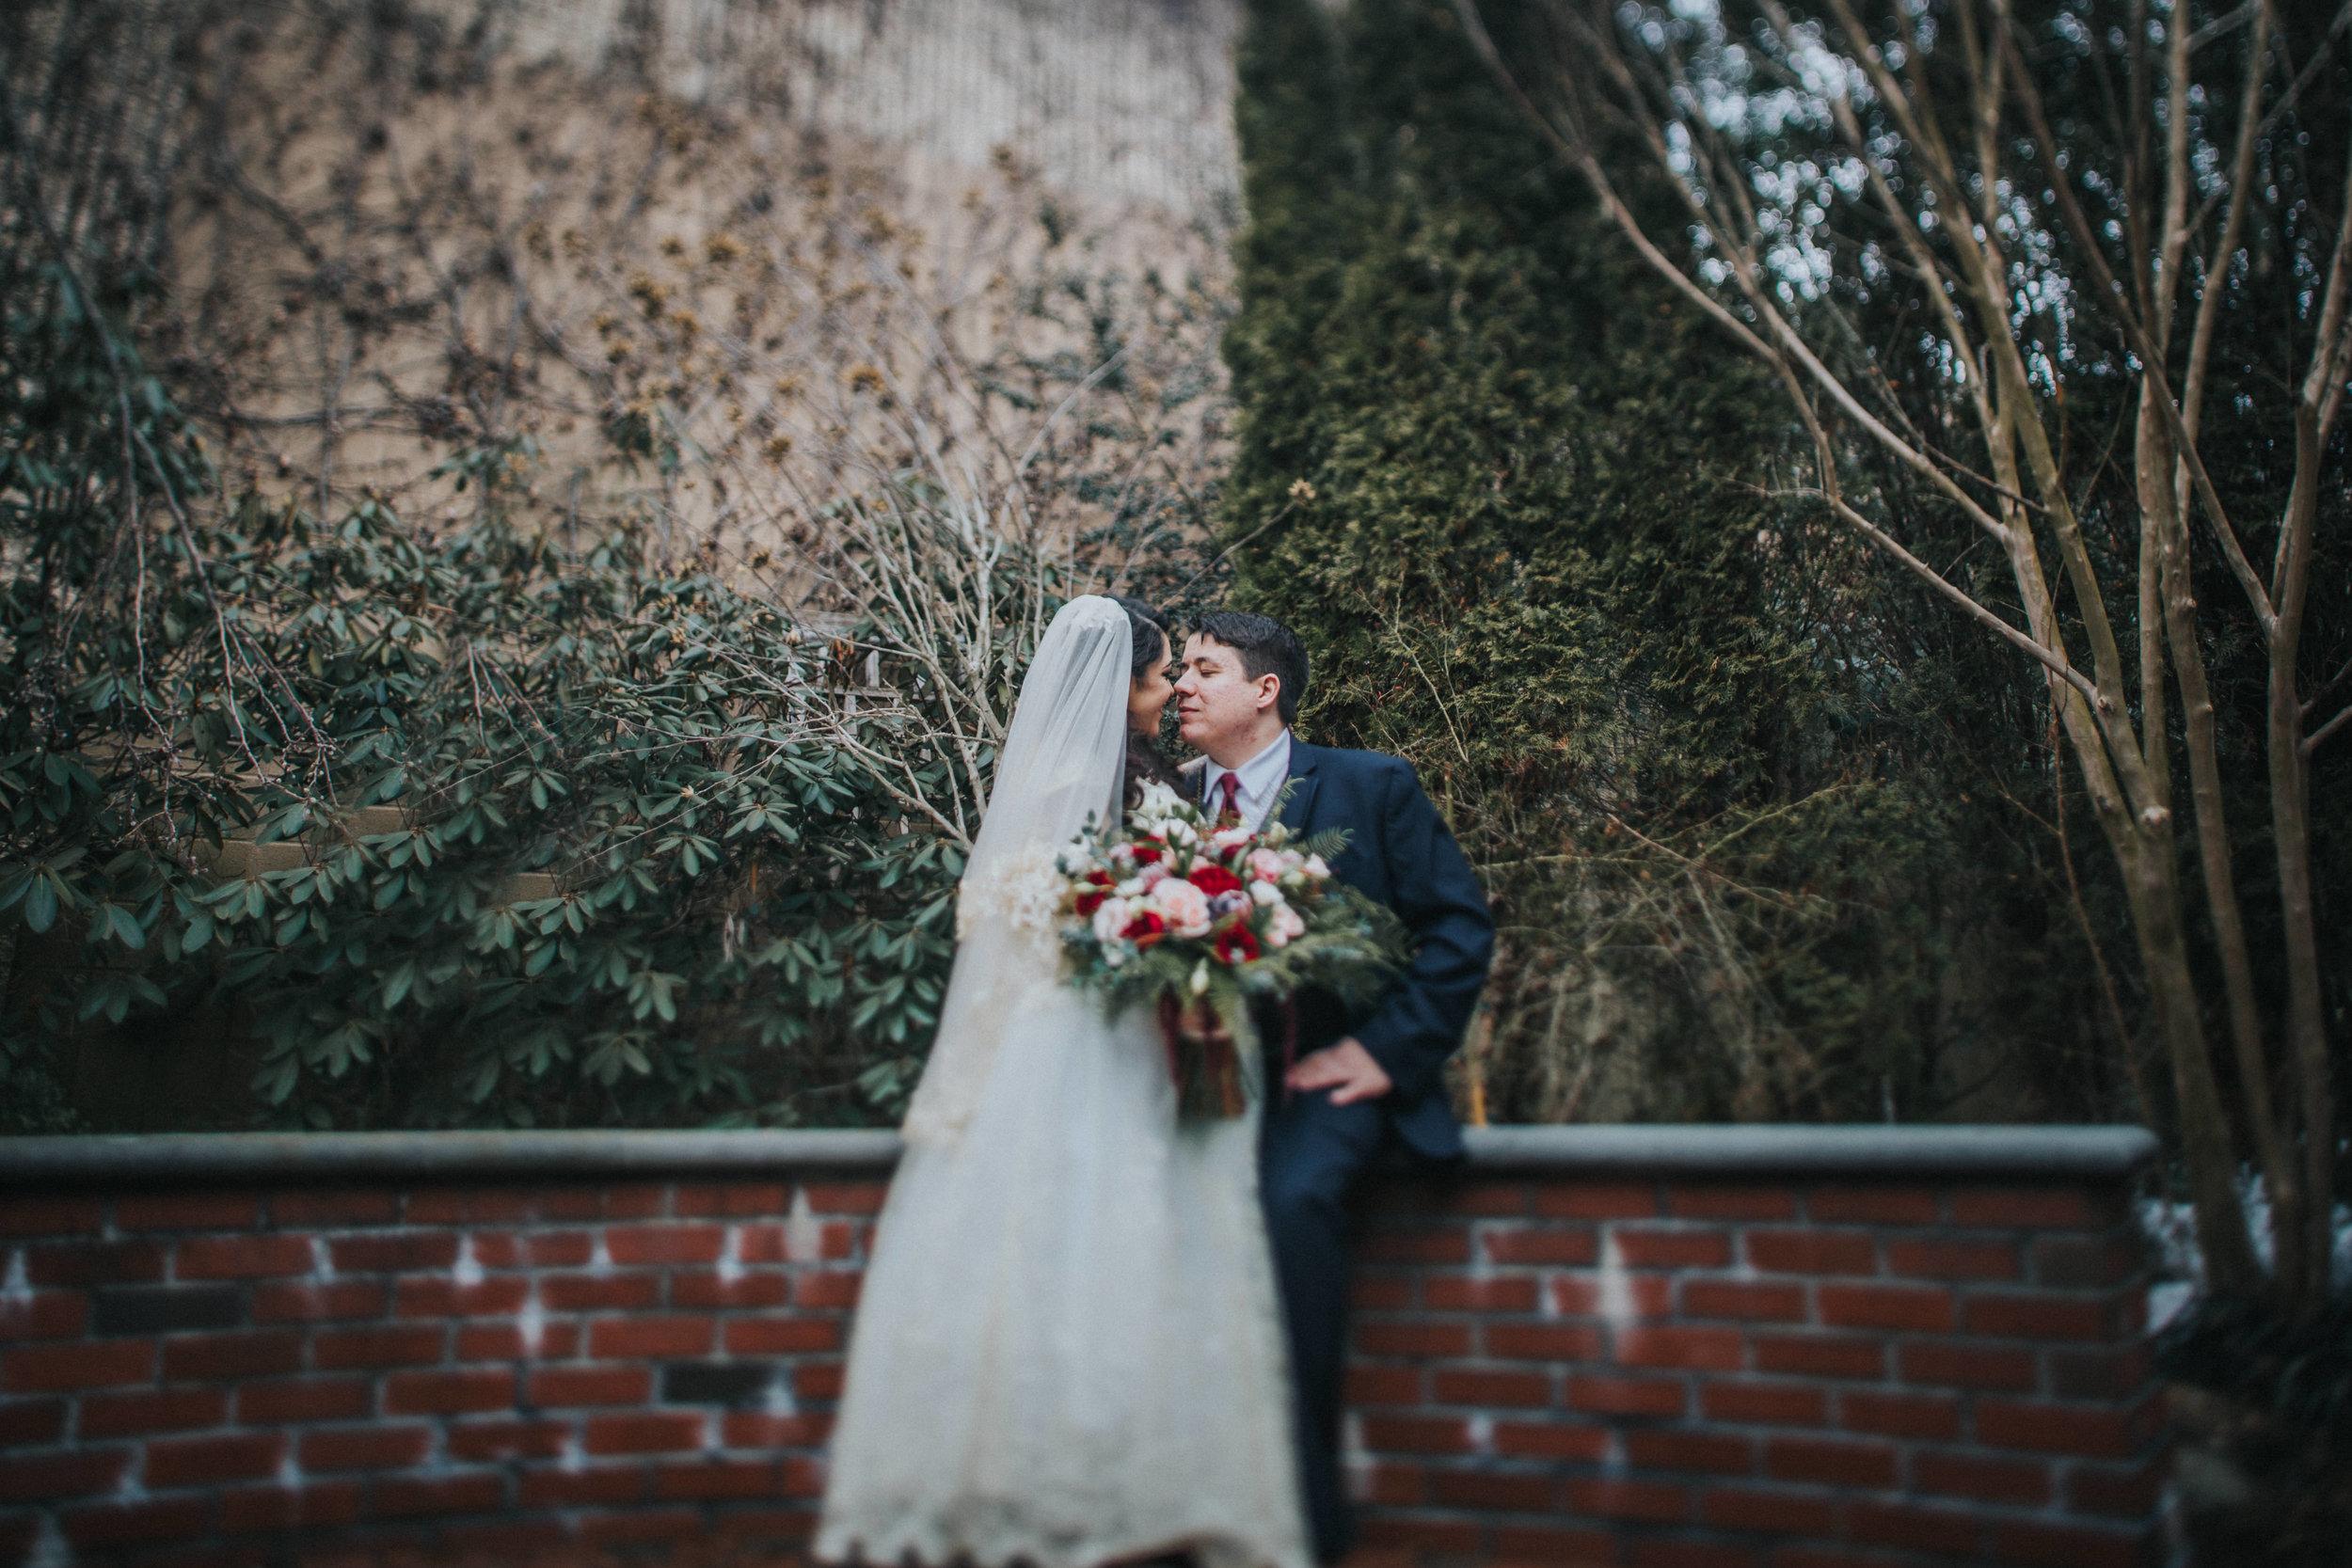 New-Jersey-Wedding-Photographer-ReceptionCenter-Valeria&Mike-First-Look-Bride&Groom (32 of 69).jpg